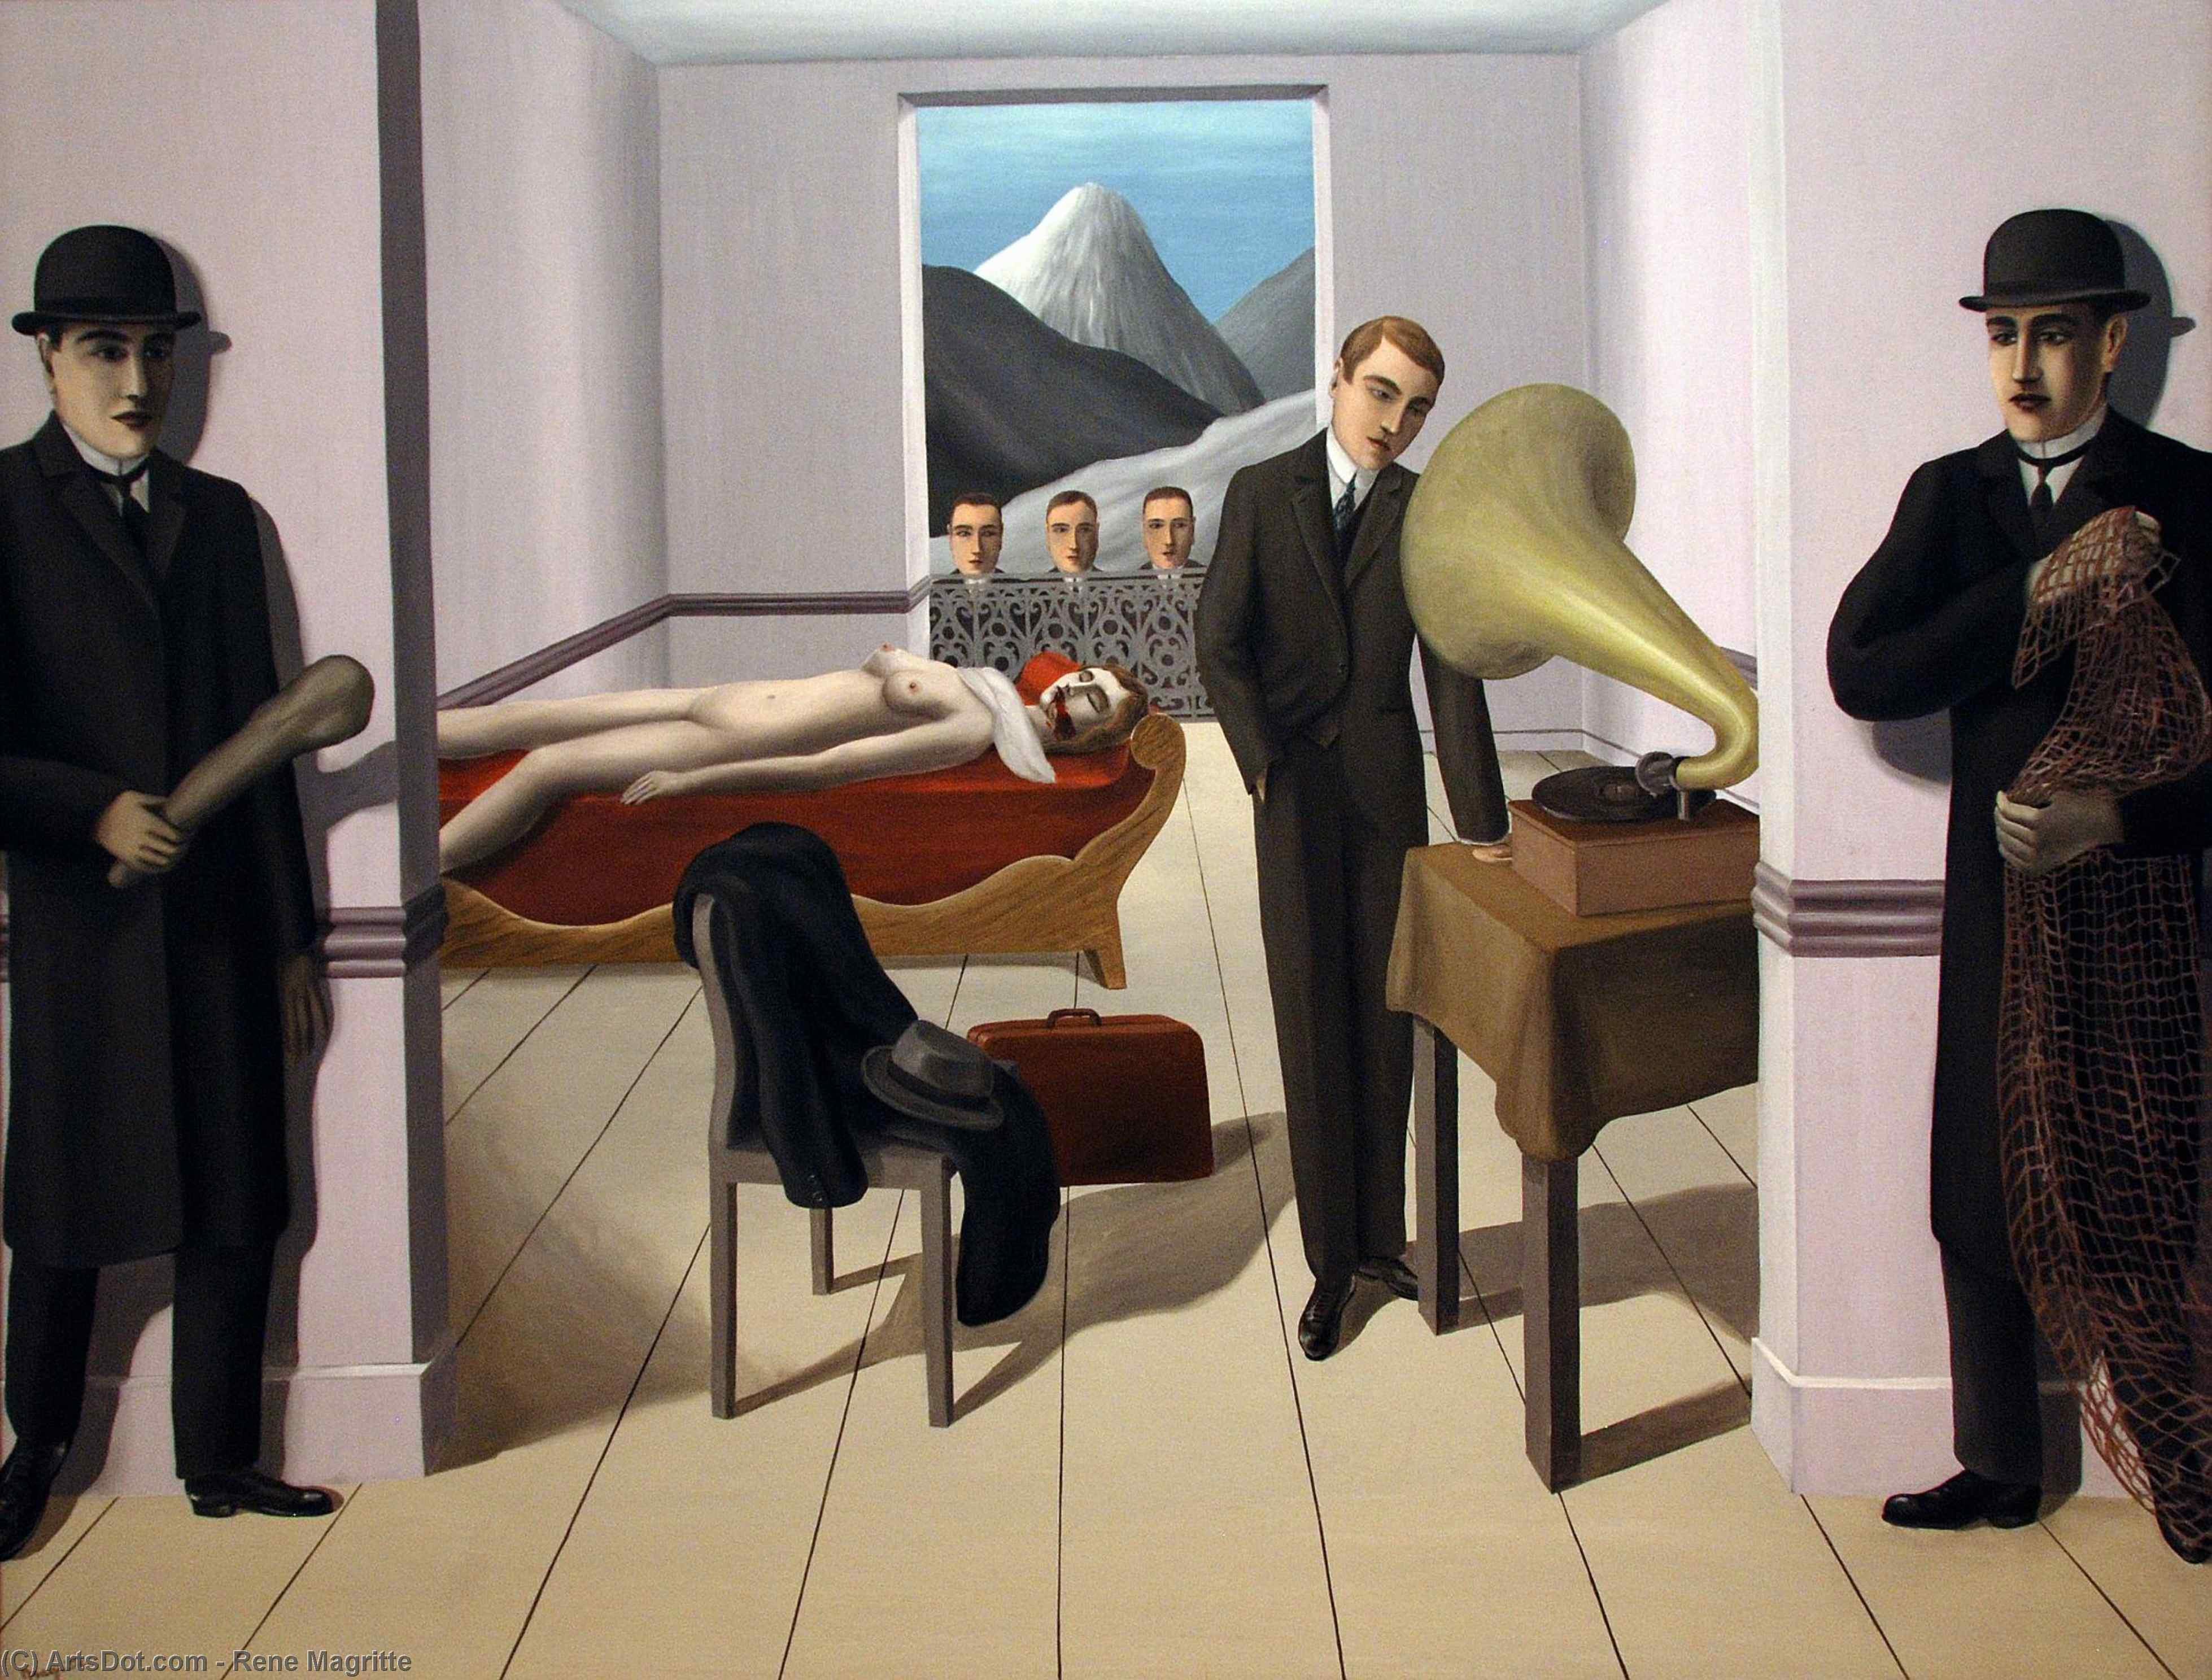 El amenazado Asesino  - Rene Magritte